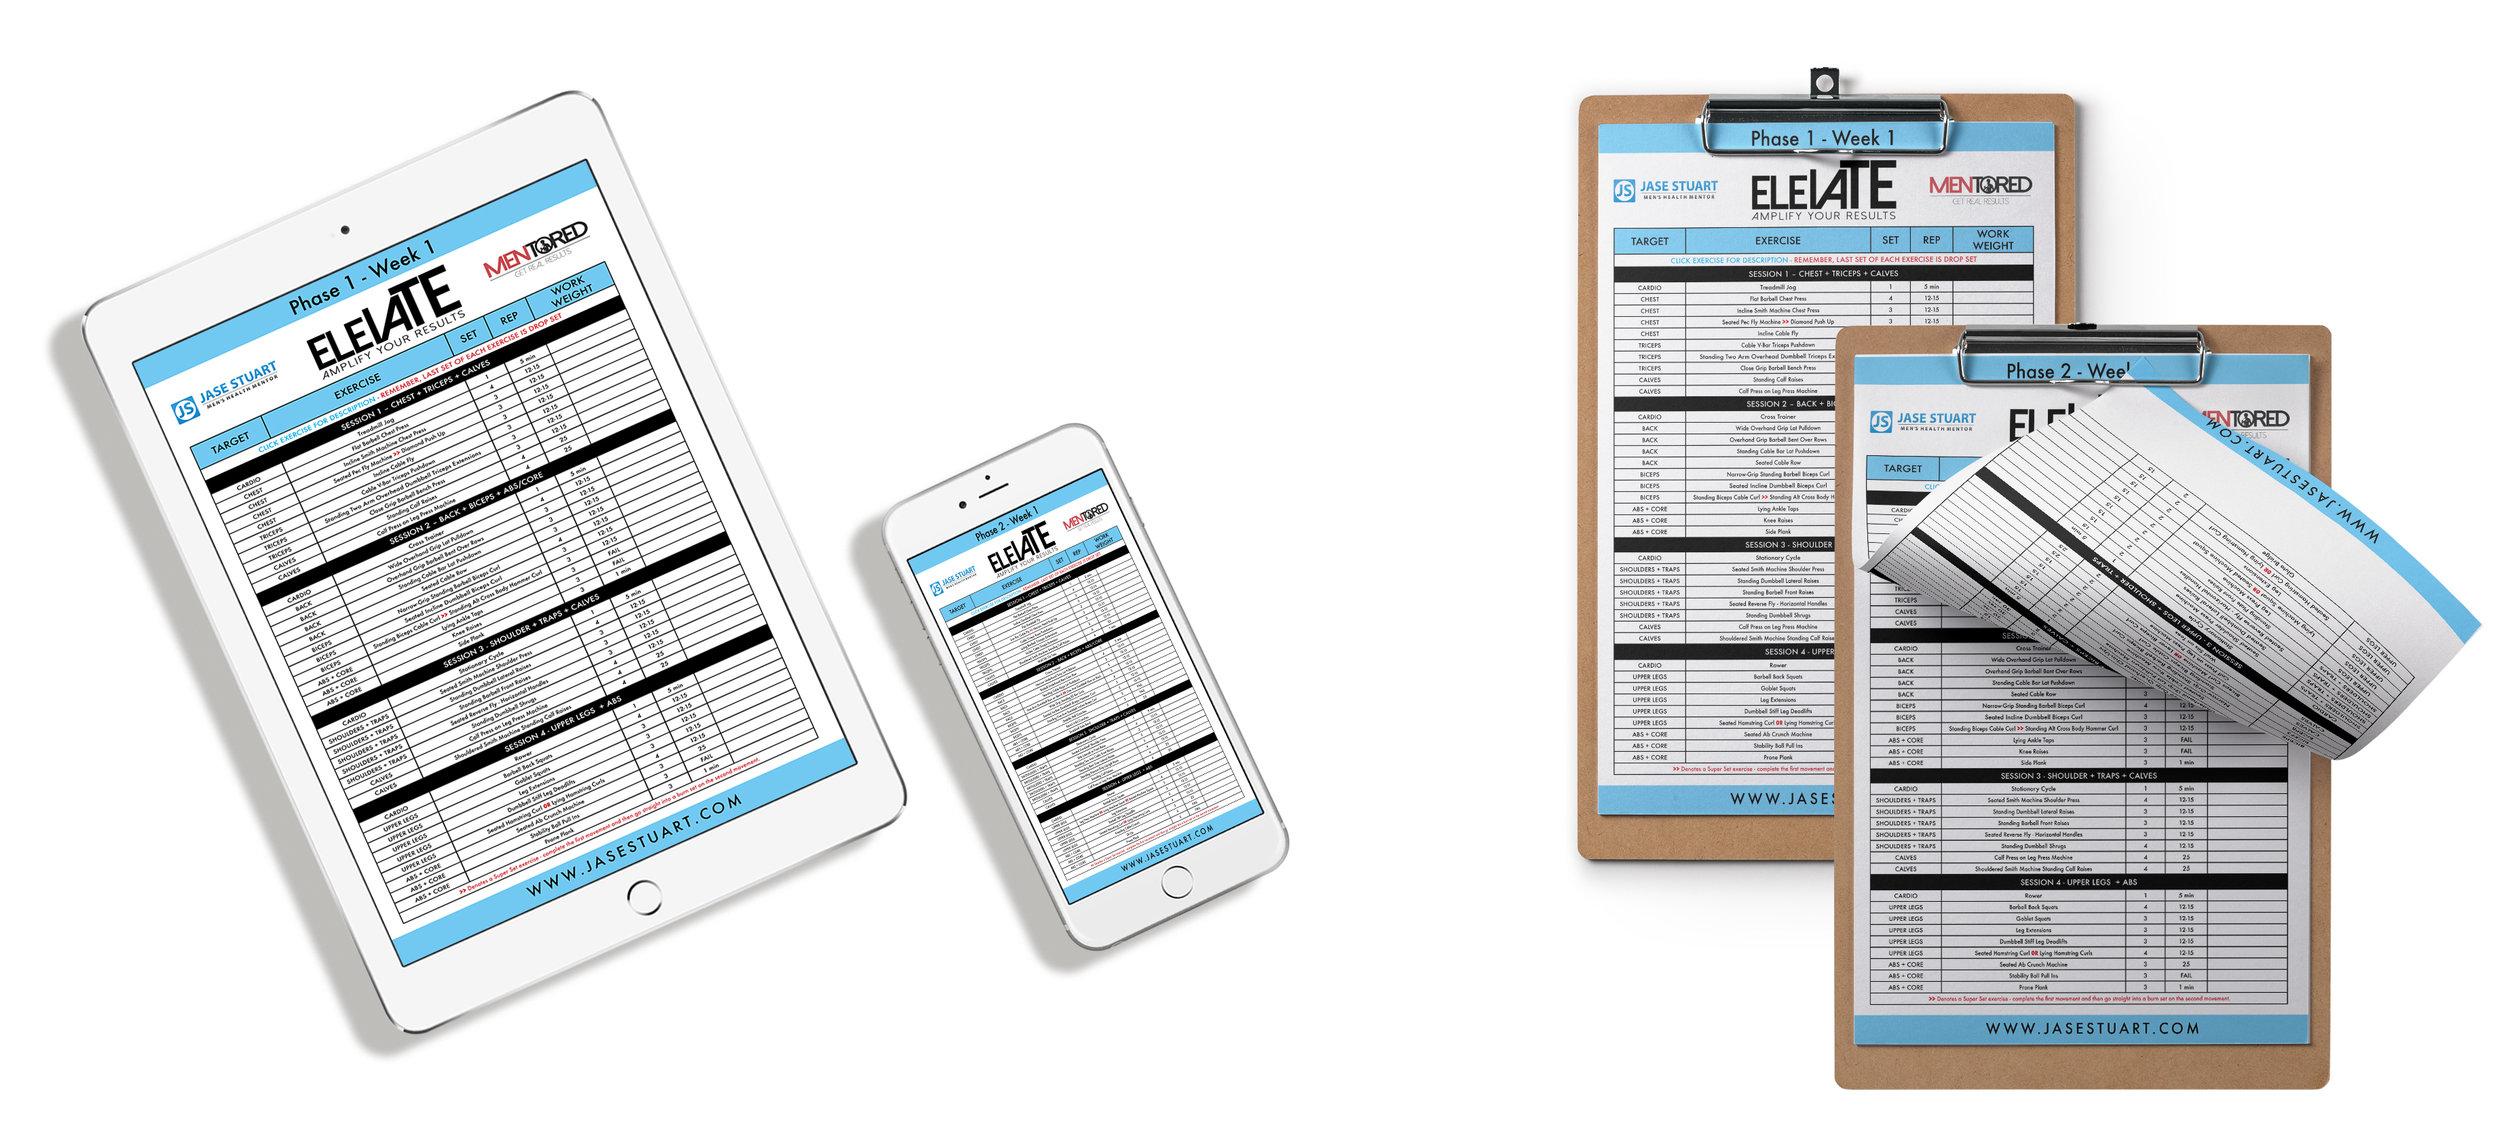 Printable Lifting Log - iPad + iPHONE + Clip.jpg